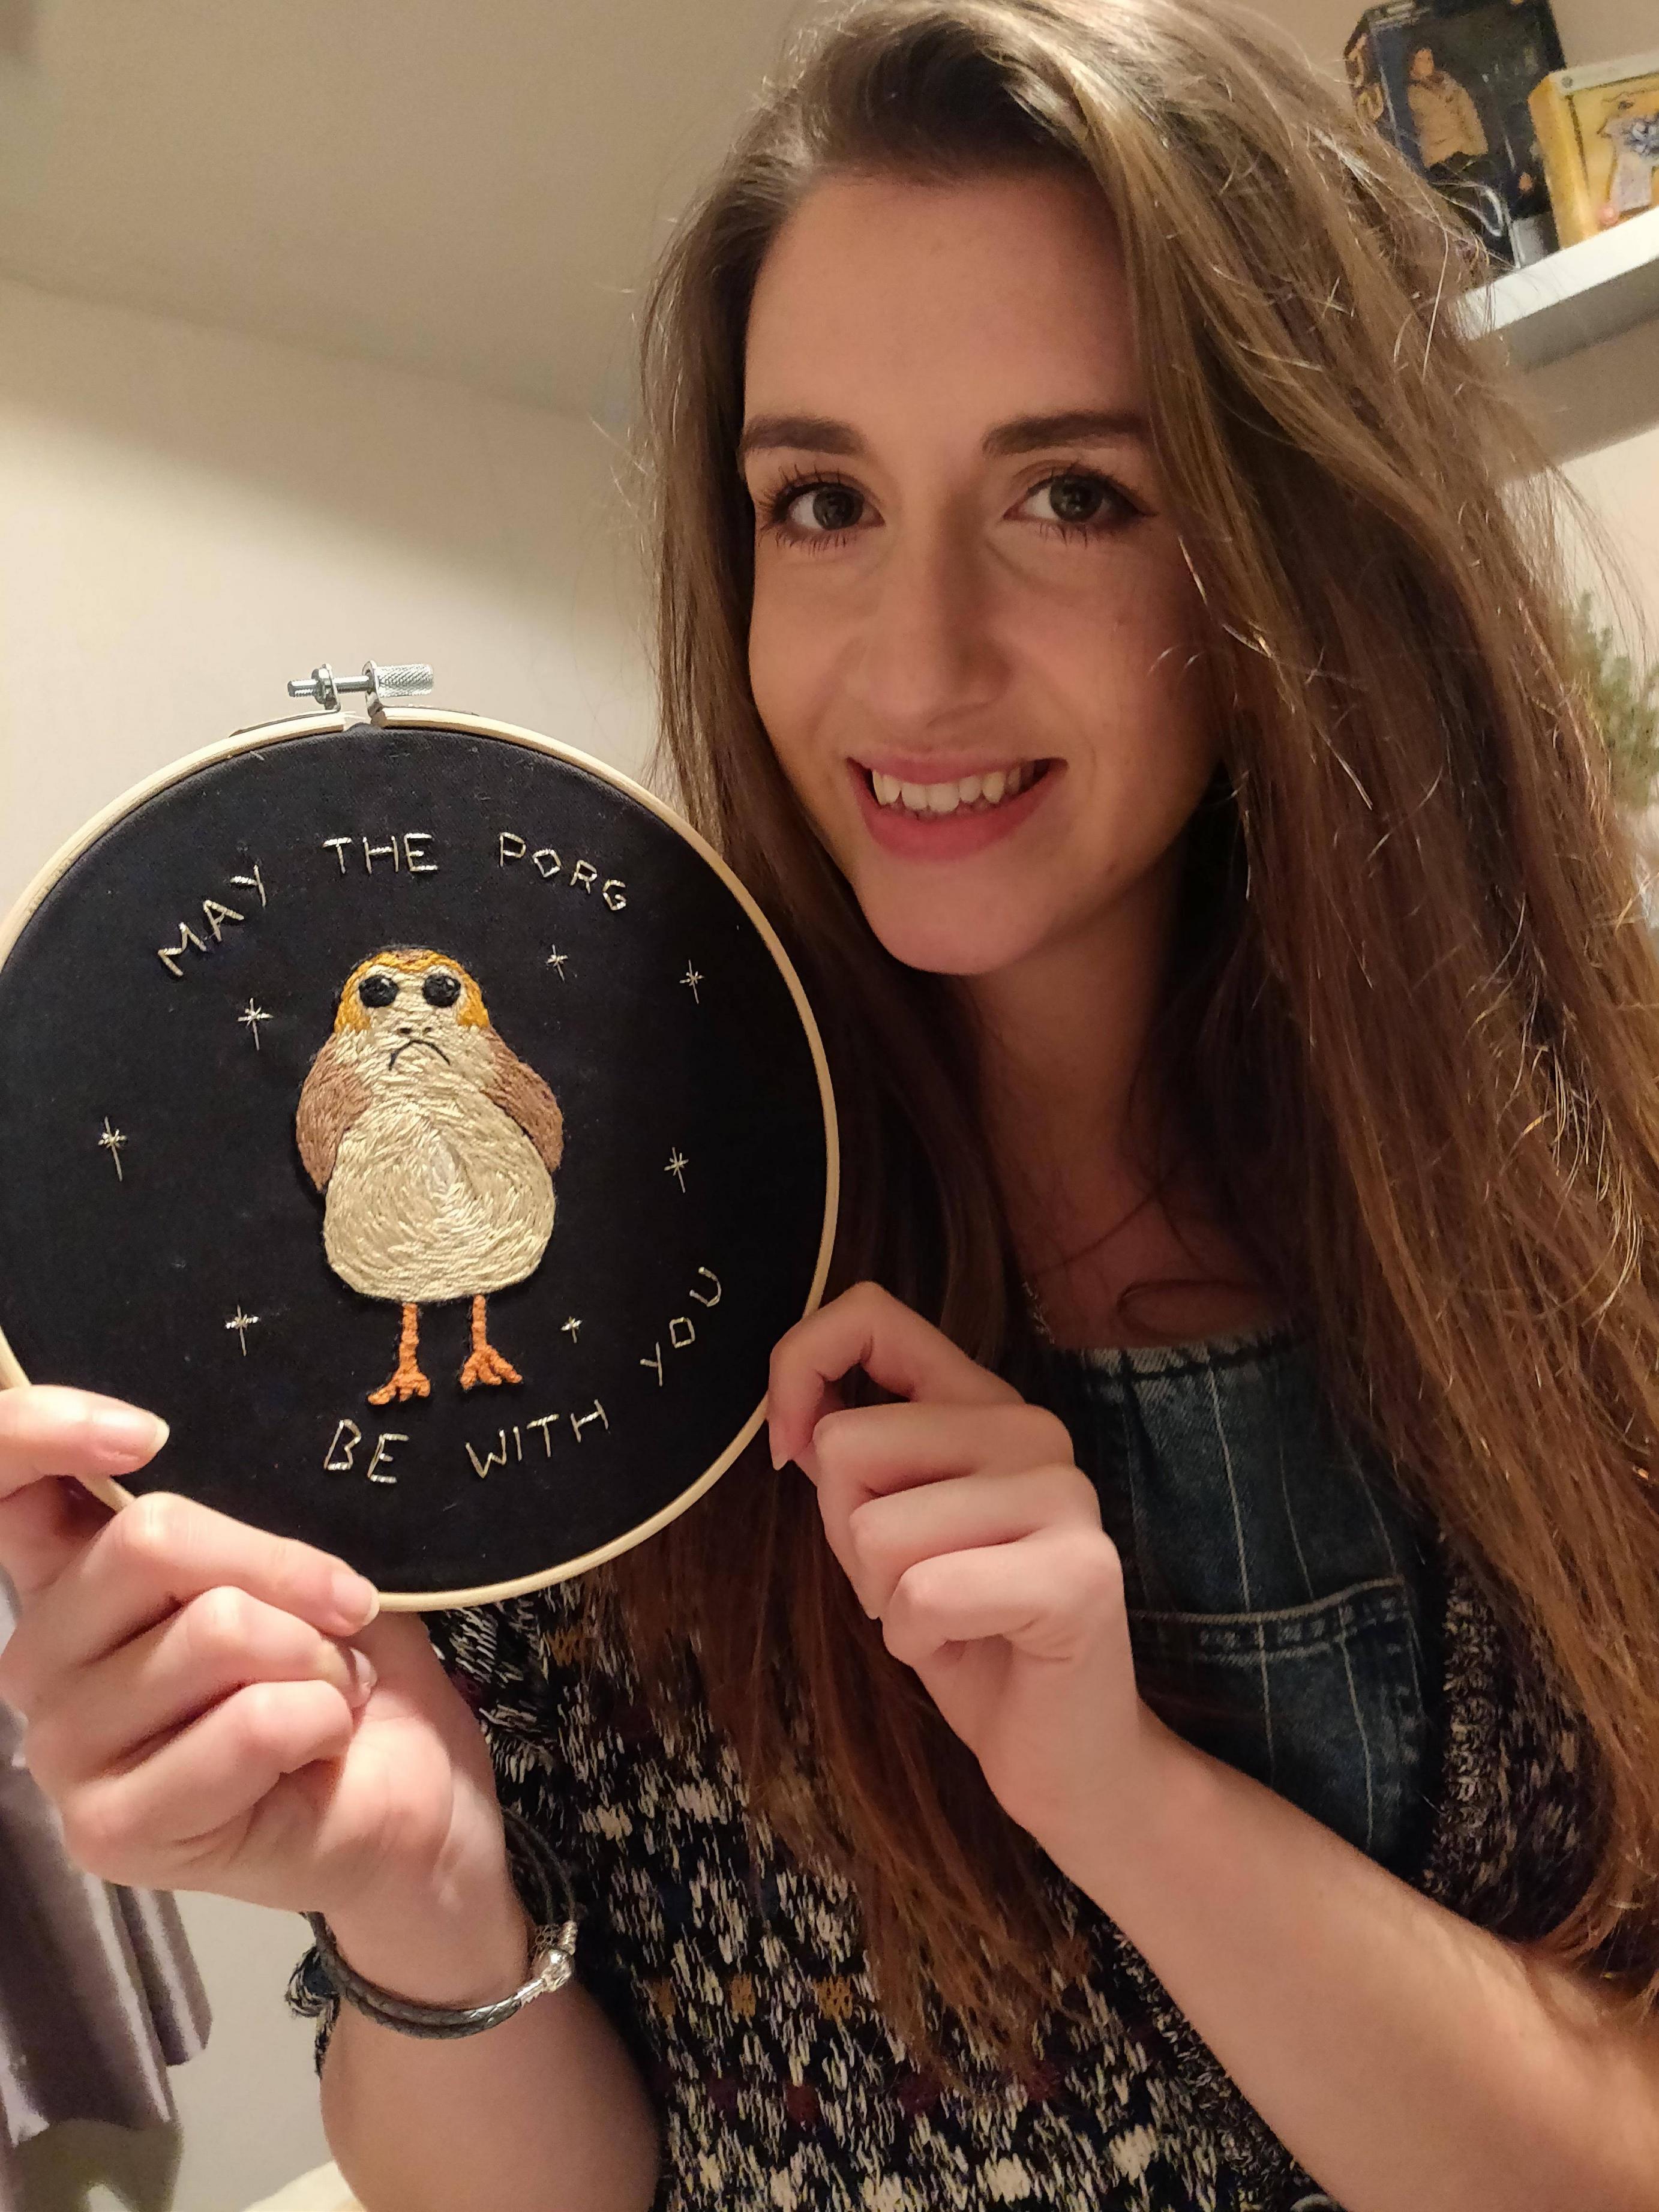 She finally made me an embroidery hoop!